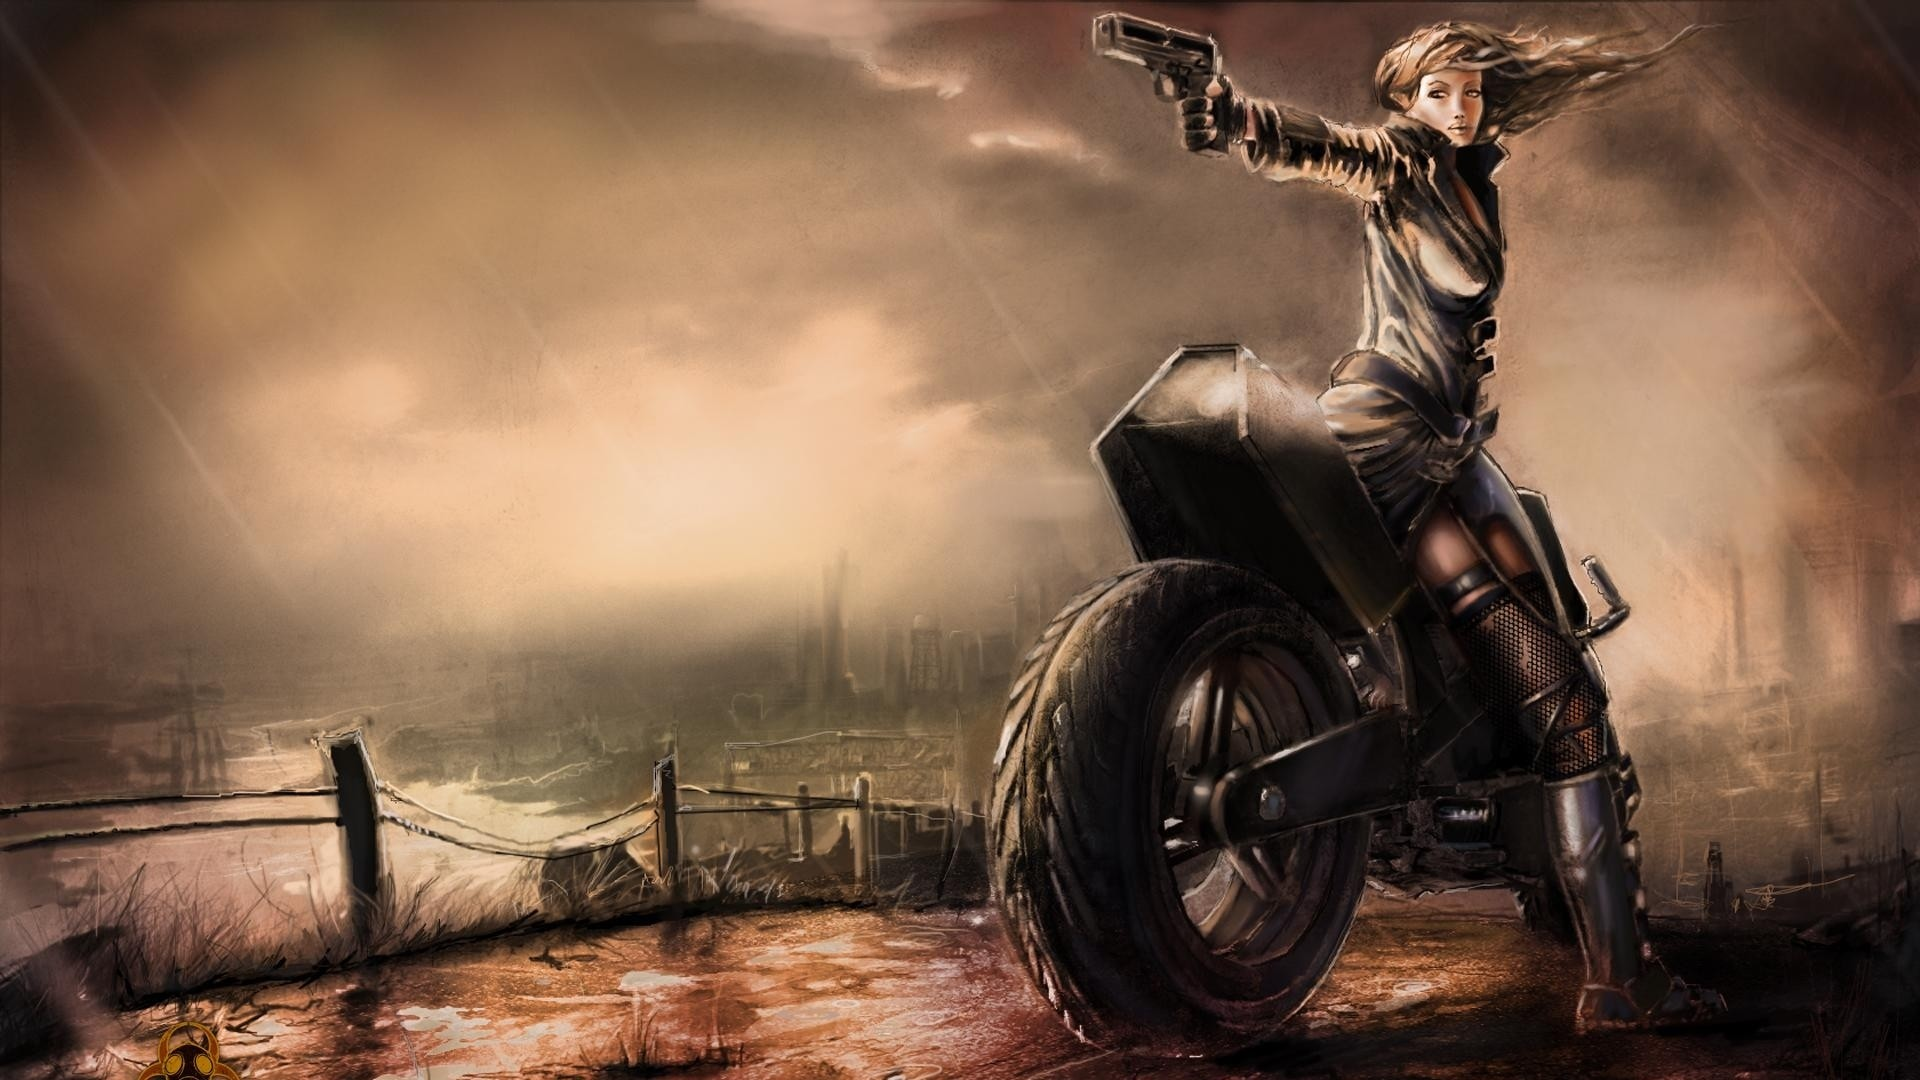 Wallpaper freedom fighters, girl, pistol, motorcycle, rain